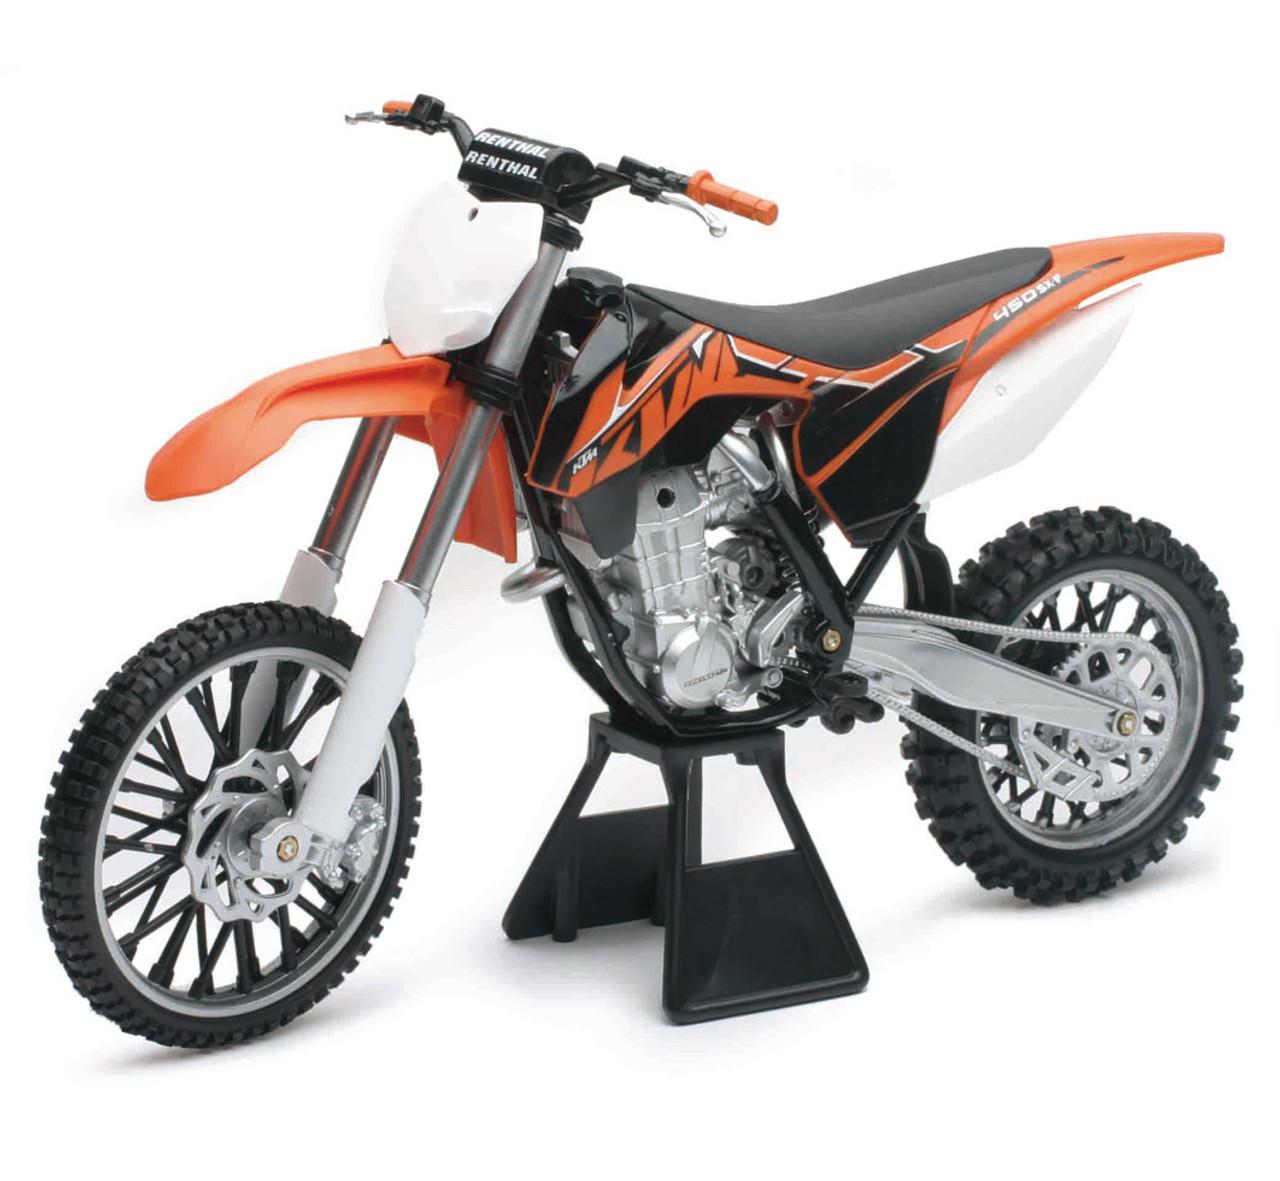 1 6 Scale Ktm 450sx F Dirt Bike Toy Diecast Toy New Ray Toys